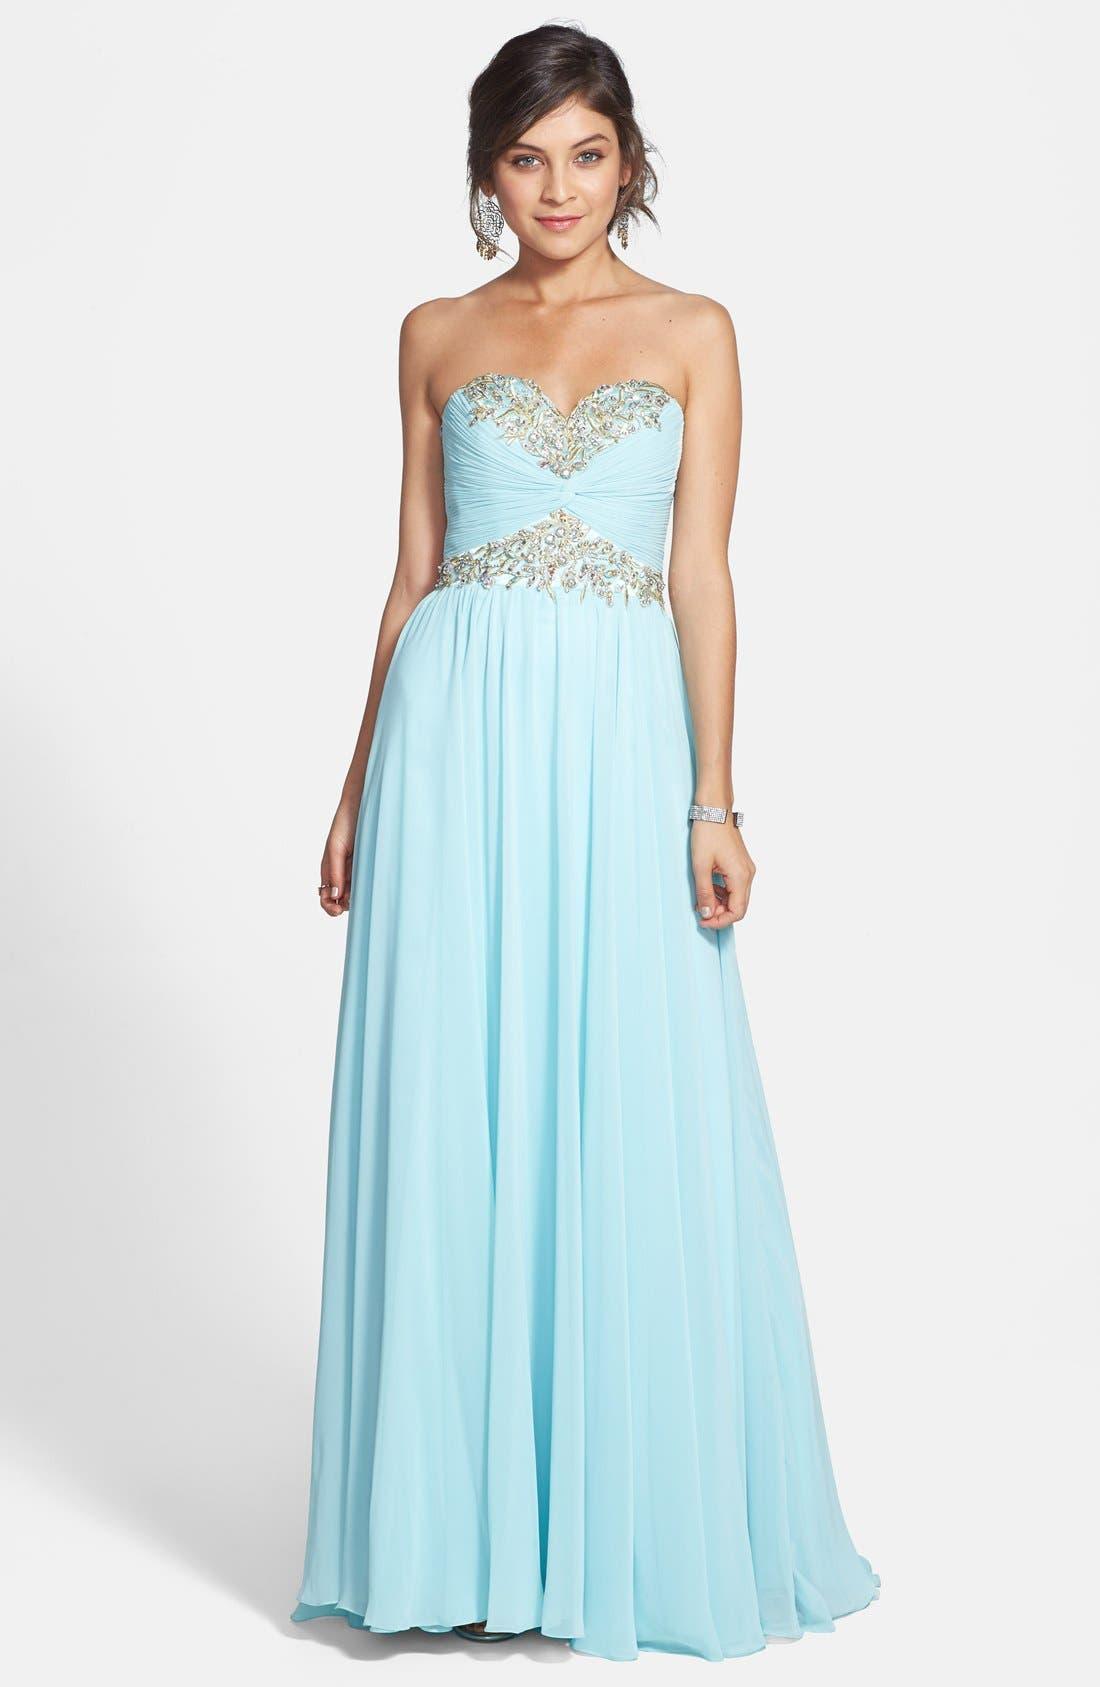 Main Image - Sherri Hill Embellished Strapless Chiffon Gown